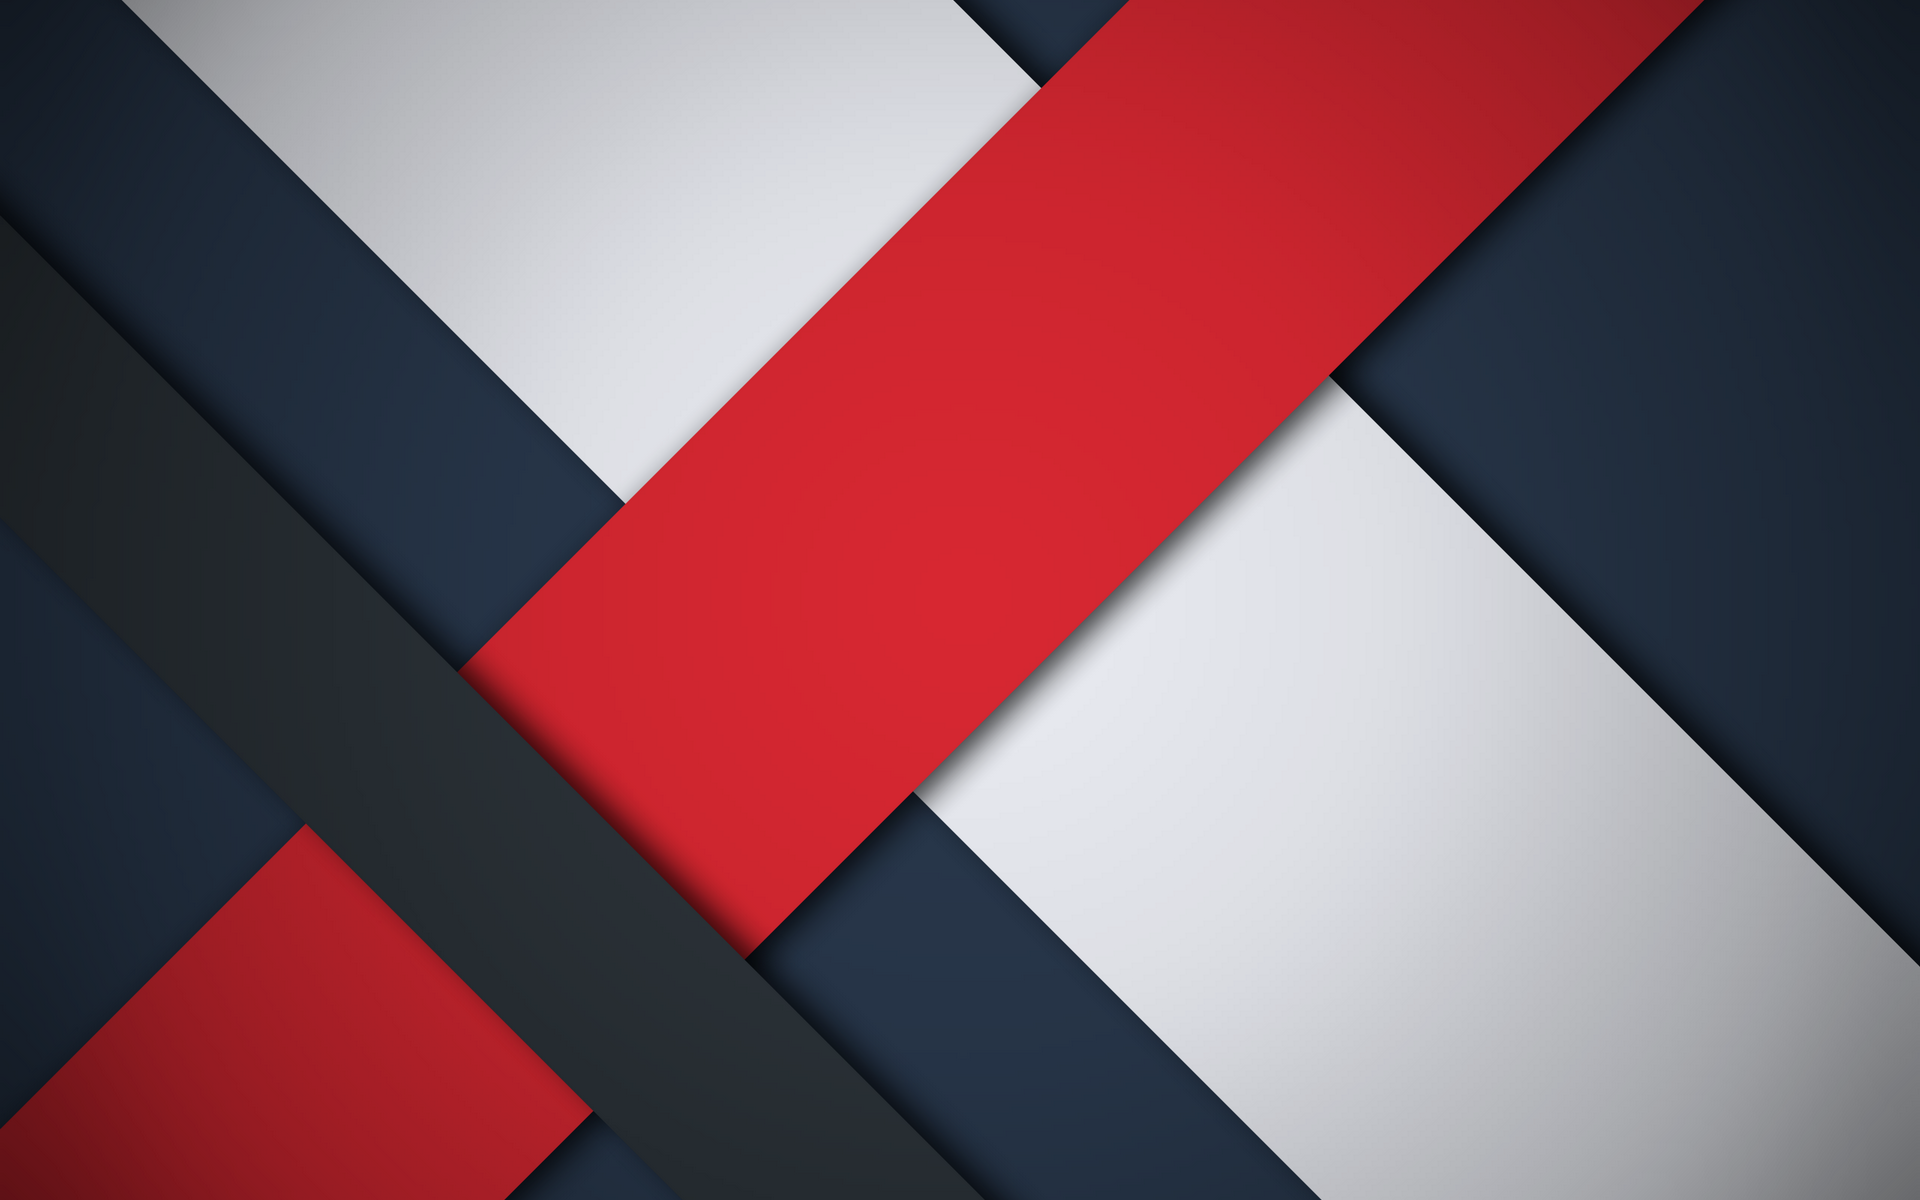 Modern Design Desktop Wallpapers Top Free Modern Design